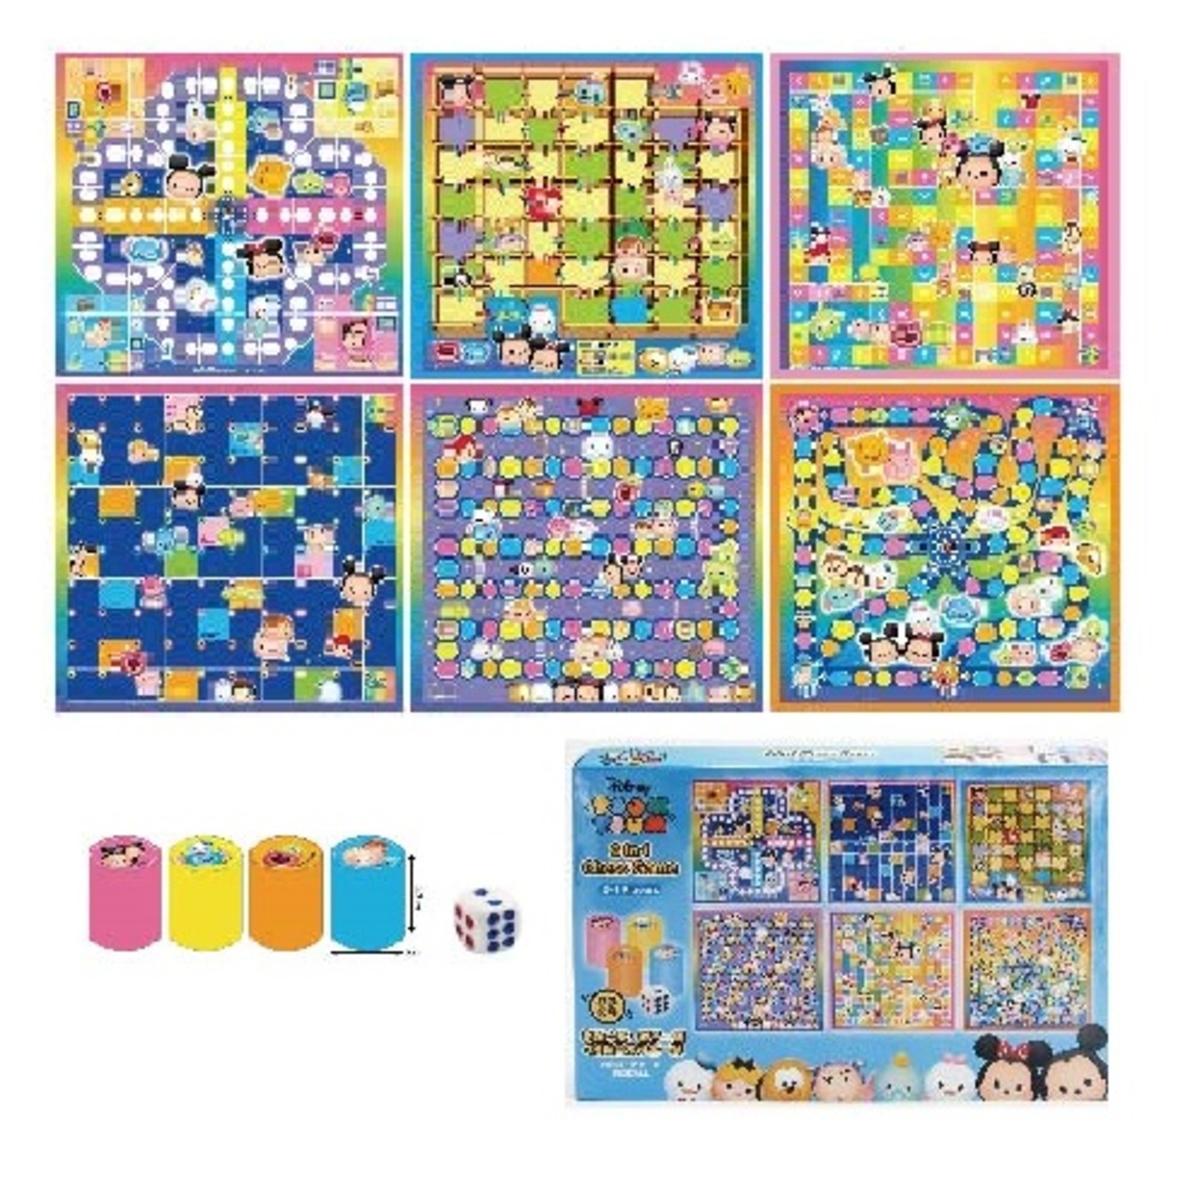 TSUM TSUM Comprehensive game chess